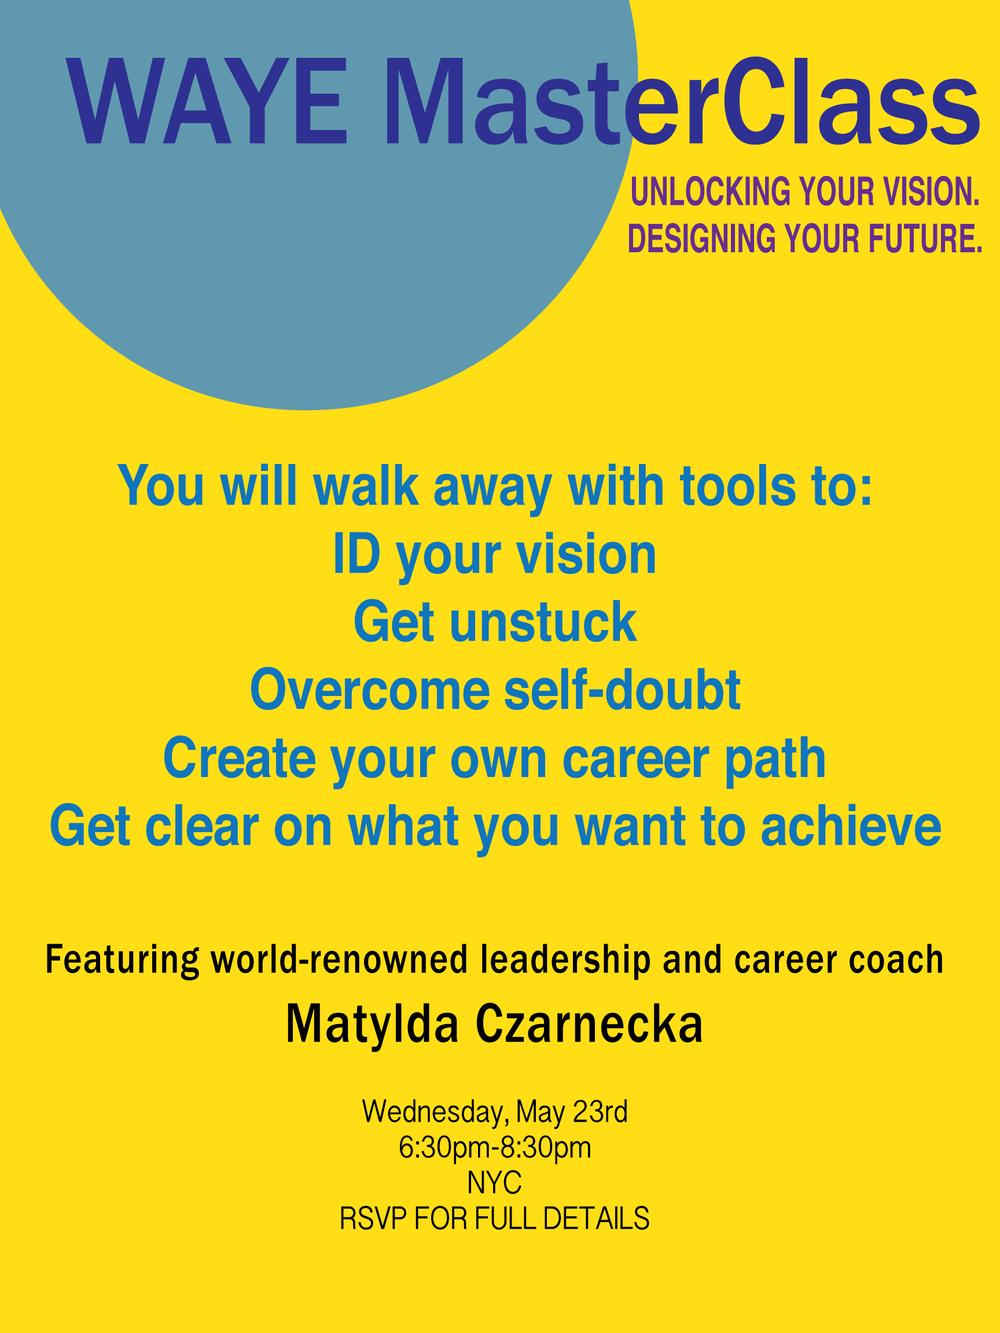 WAYE MasterClass - Unlocking Your Vision. Designing Your Future